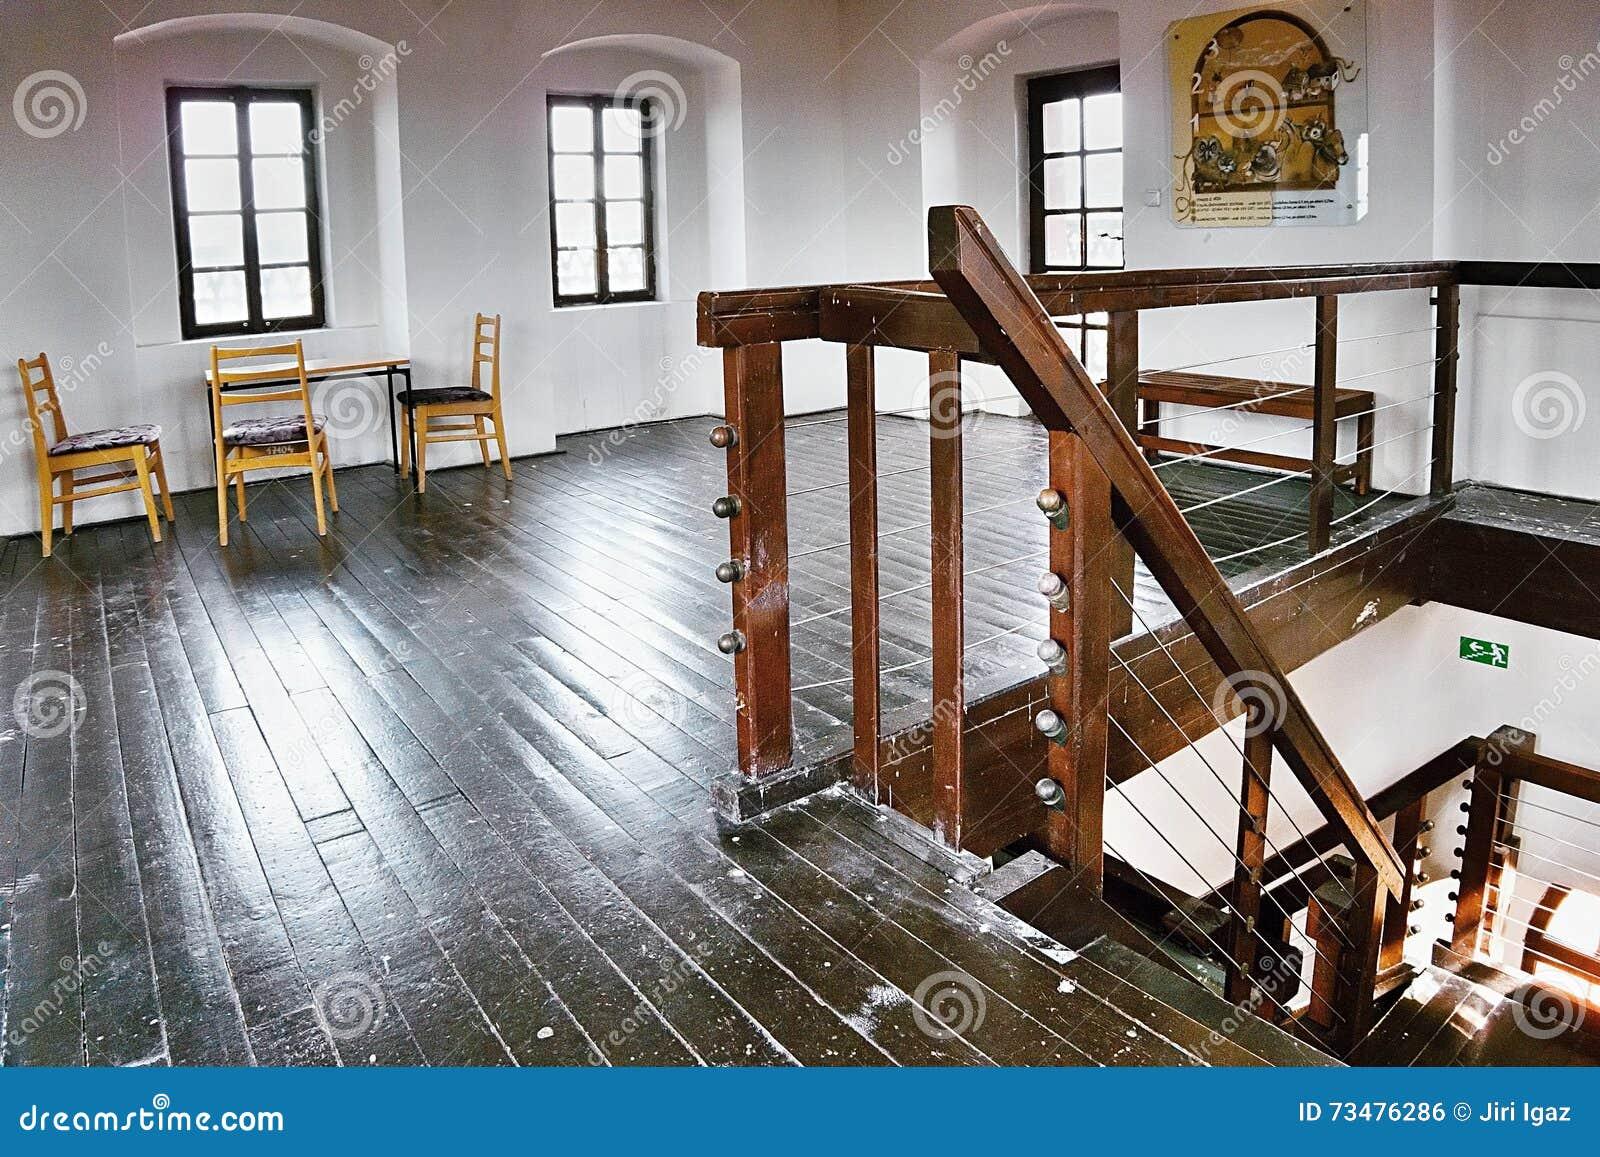 2016/06/18 Chomutov市,捷克共和国-在历史的塔'Mestska vez的'顶楼上的东部木楼梯